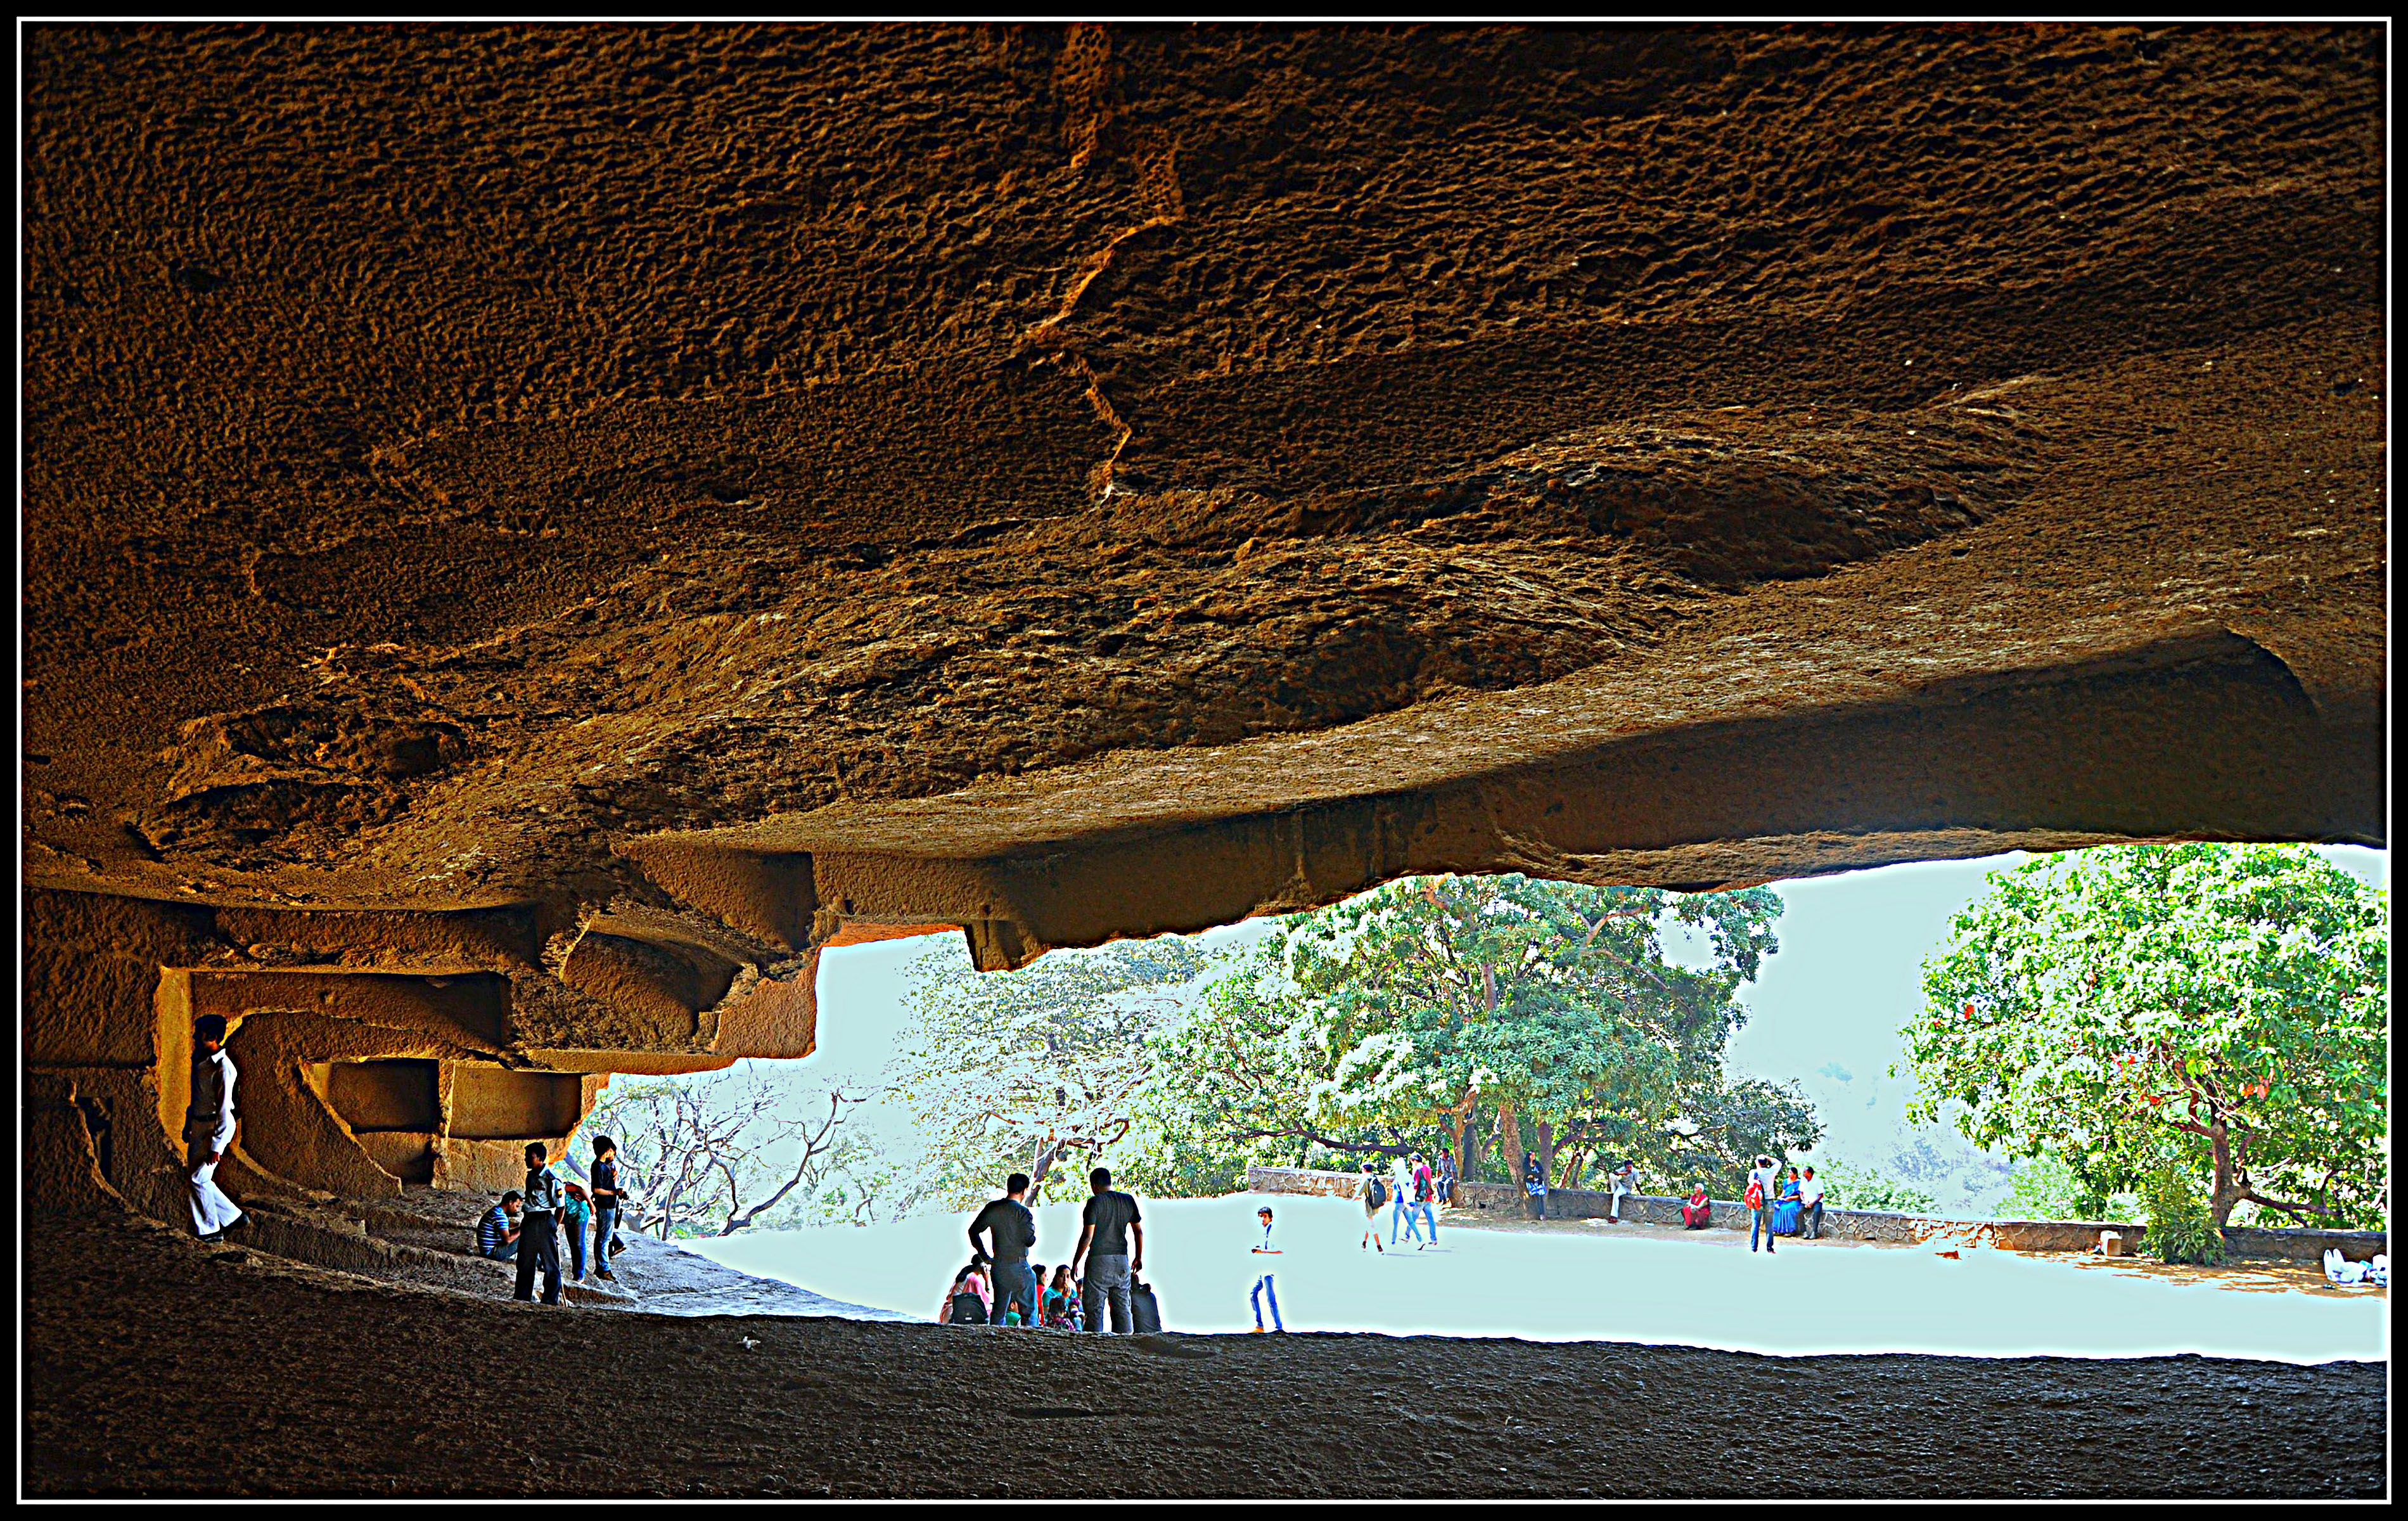 Kanheri Caves - Wikipedia